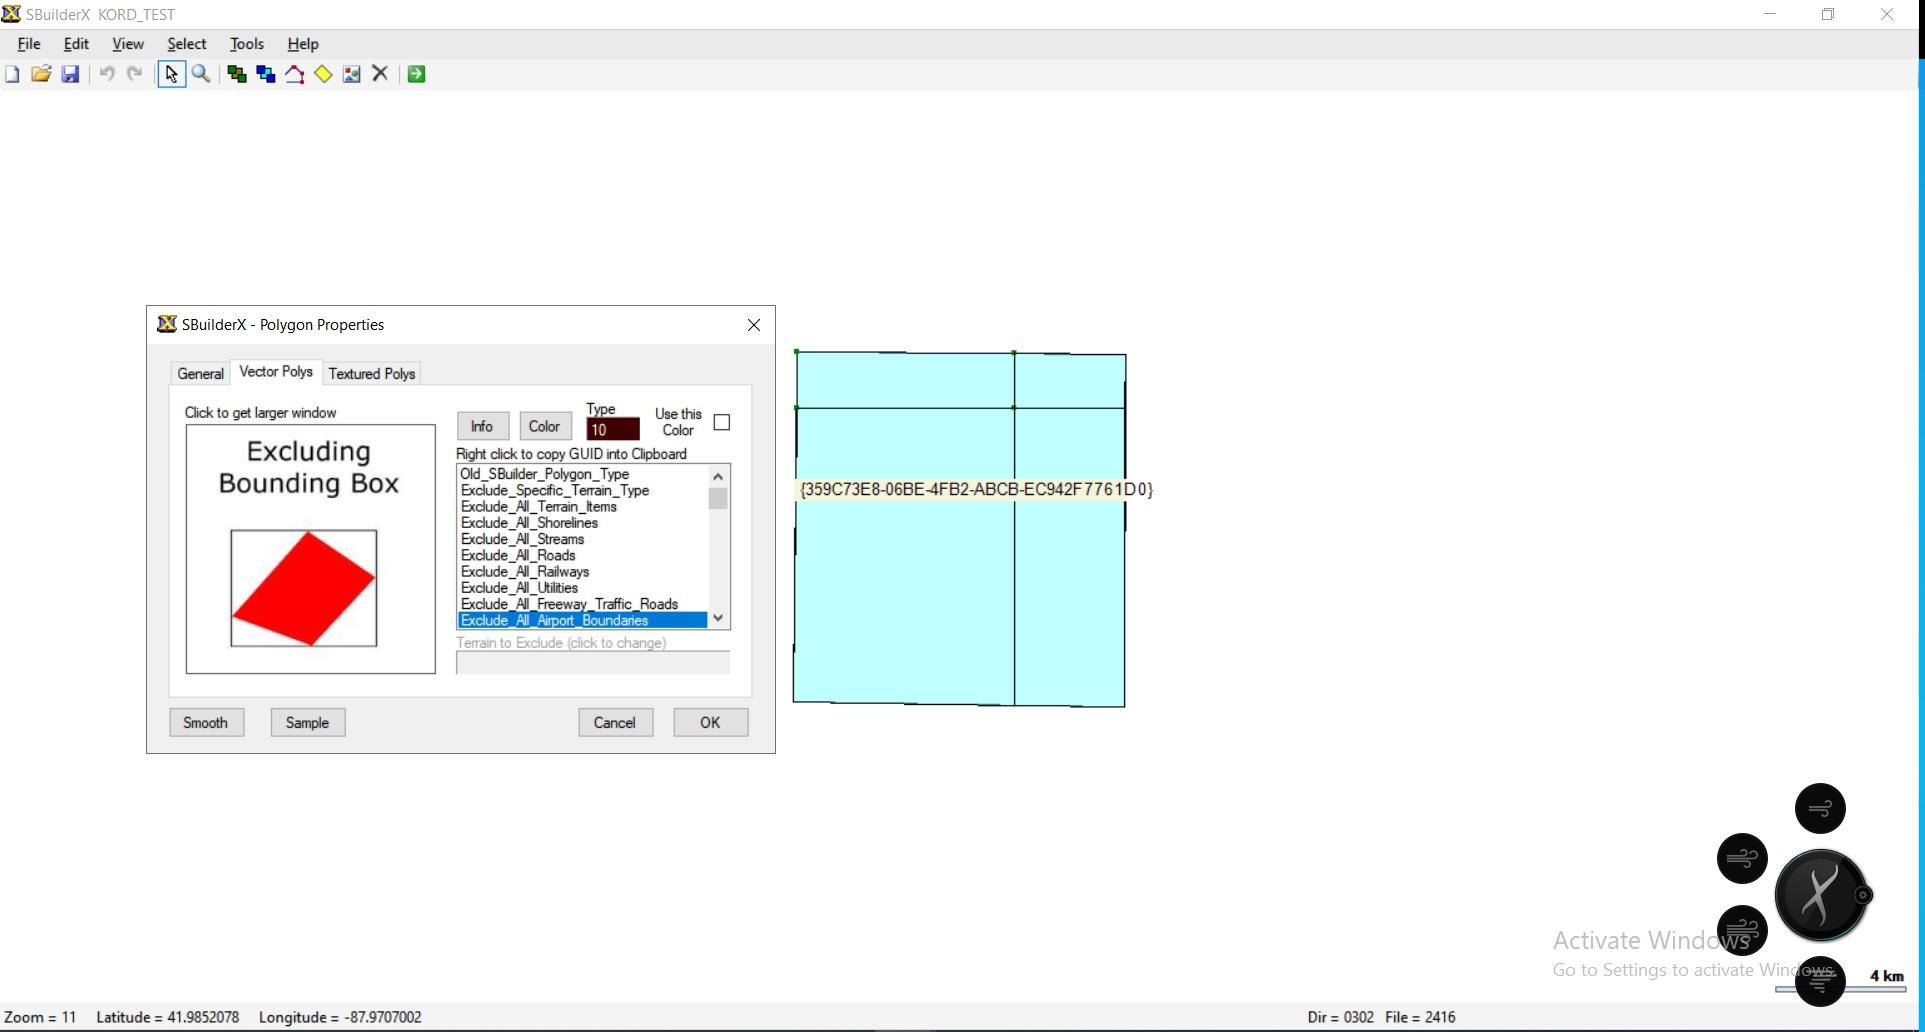 sbuilderx_christopher_britton_exx_kord_test_shp-jpg.70794